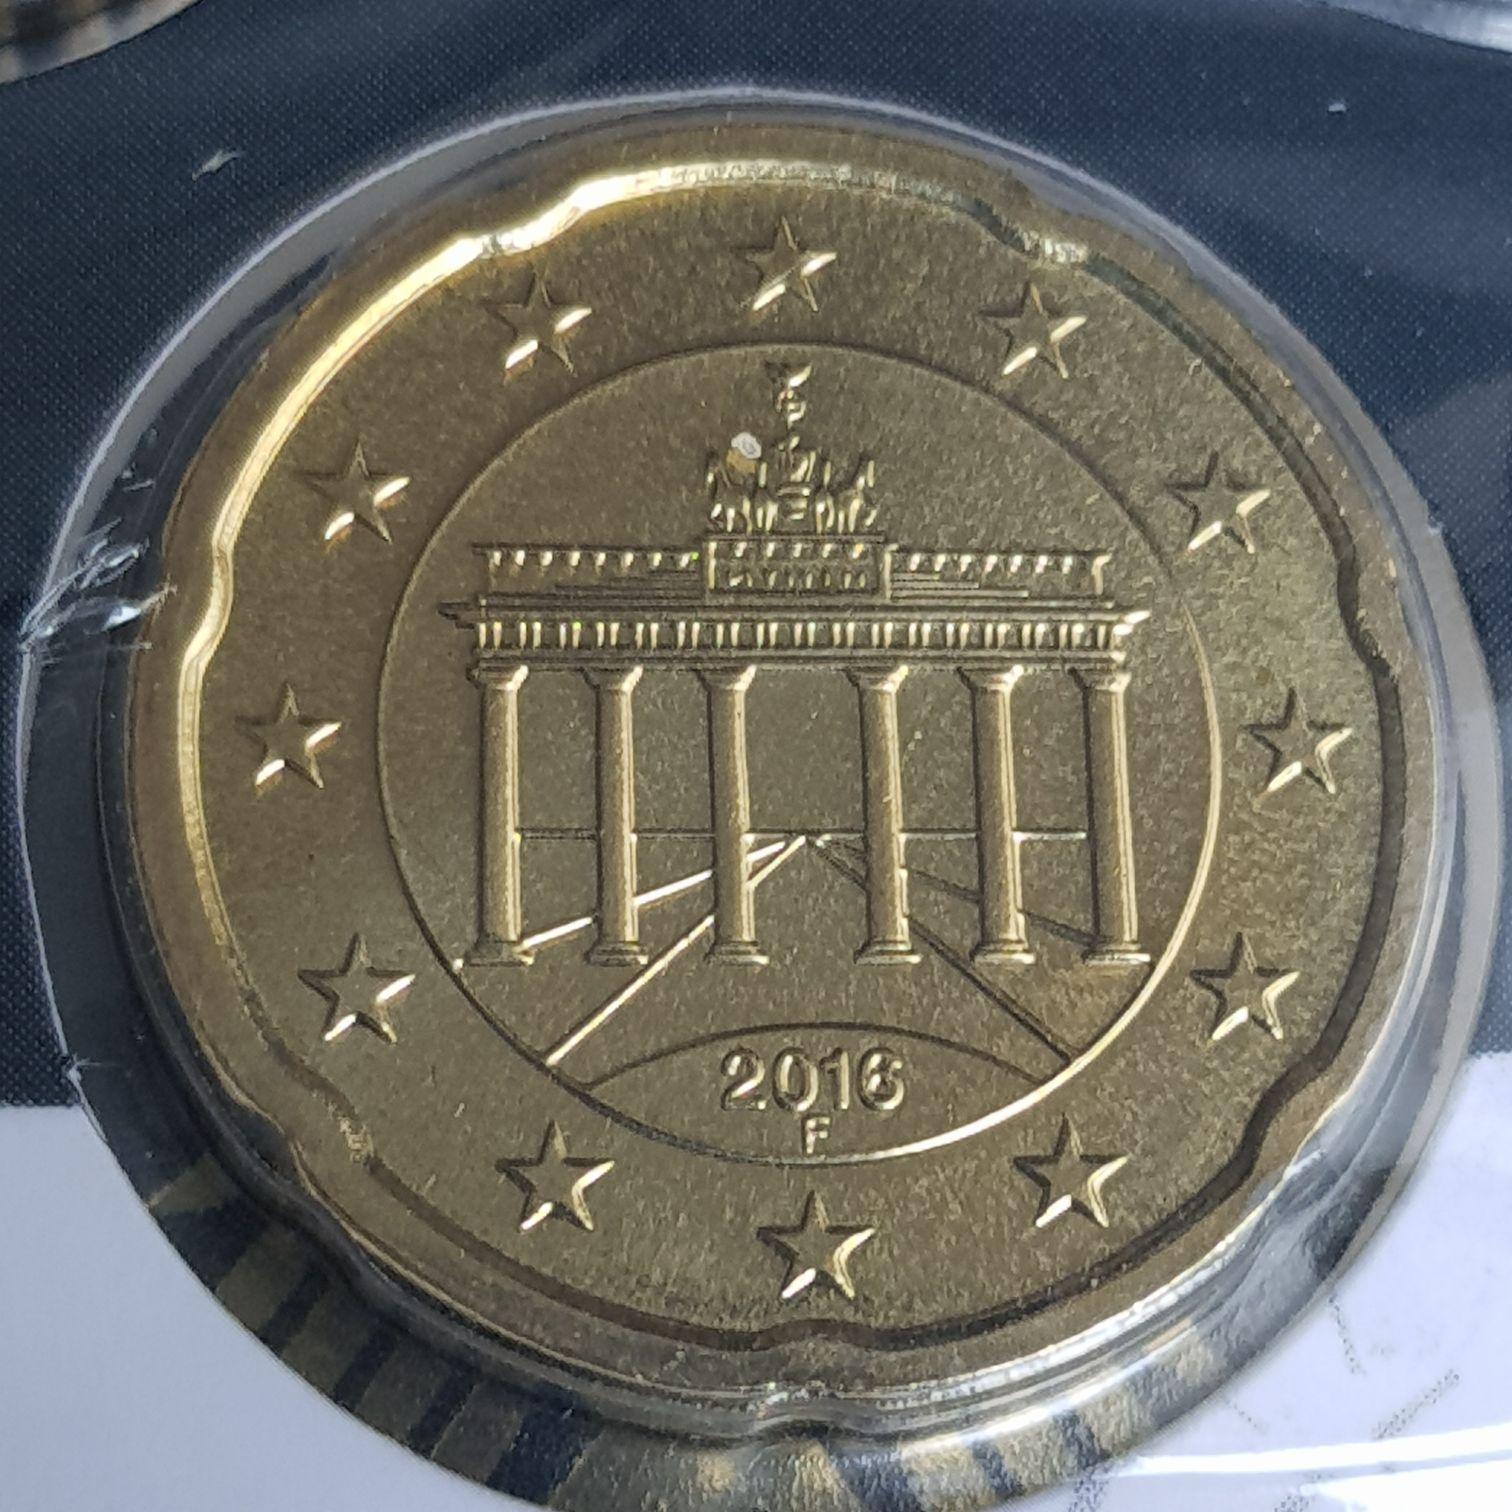 .2 Centavos De Euro Coin - $.20 (2016) back image (back cover, second image)